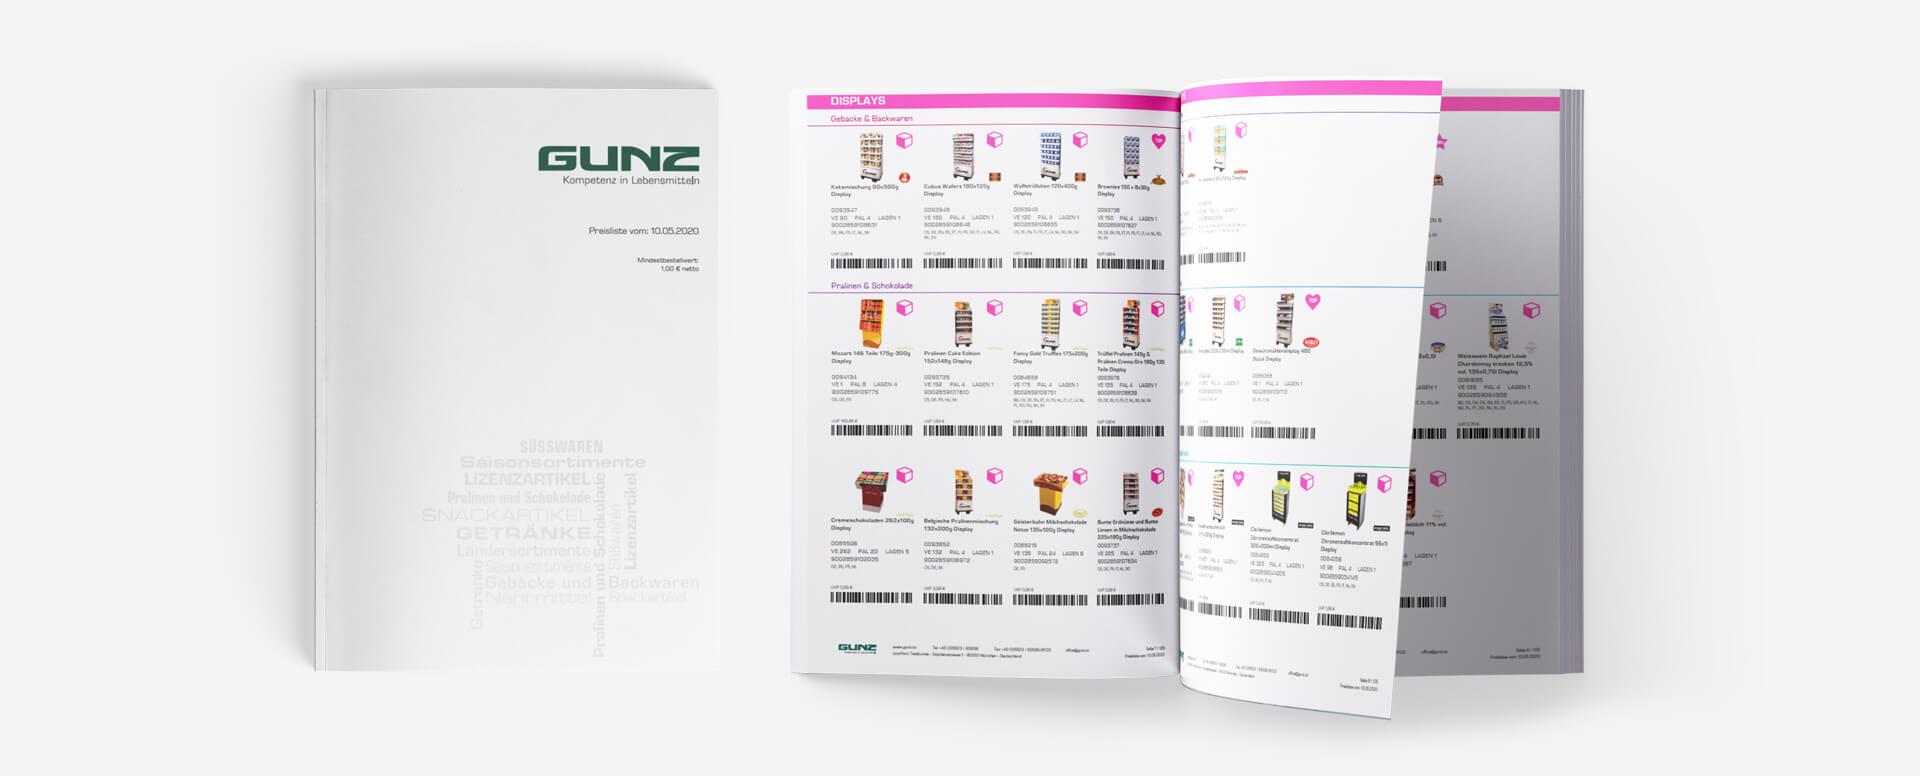 Database Publishing GUNZ Preisliste by ICONPARC